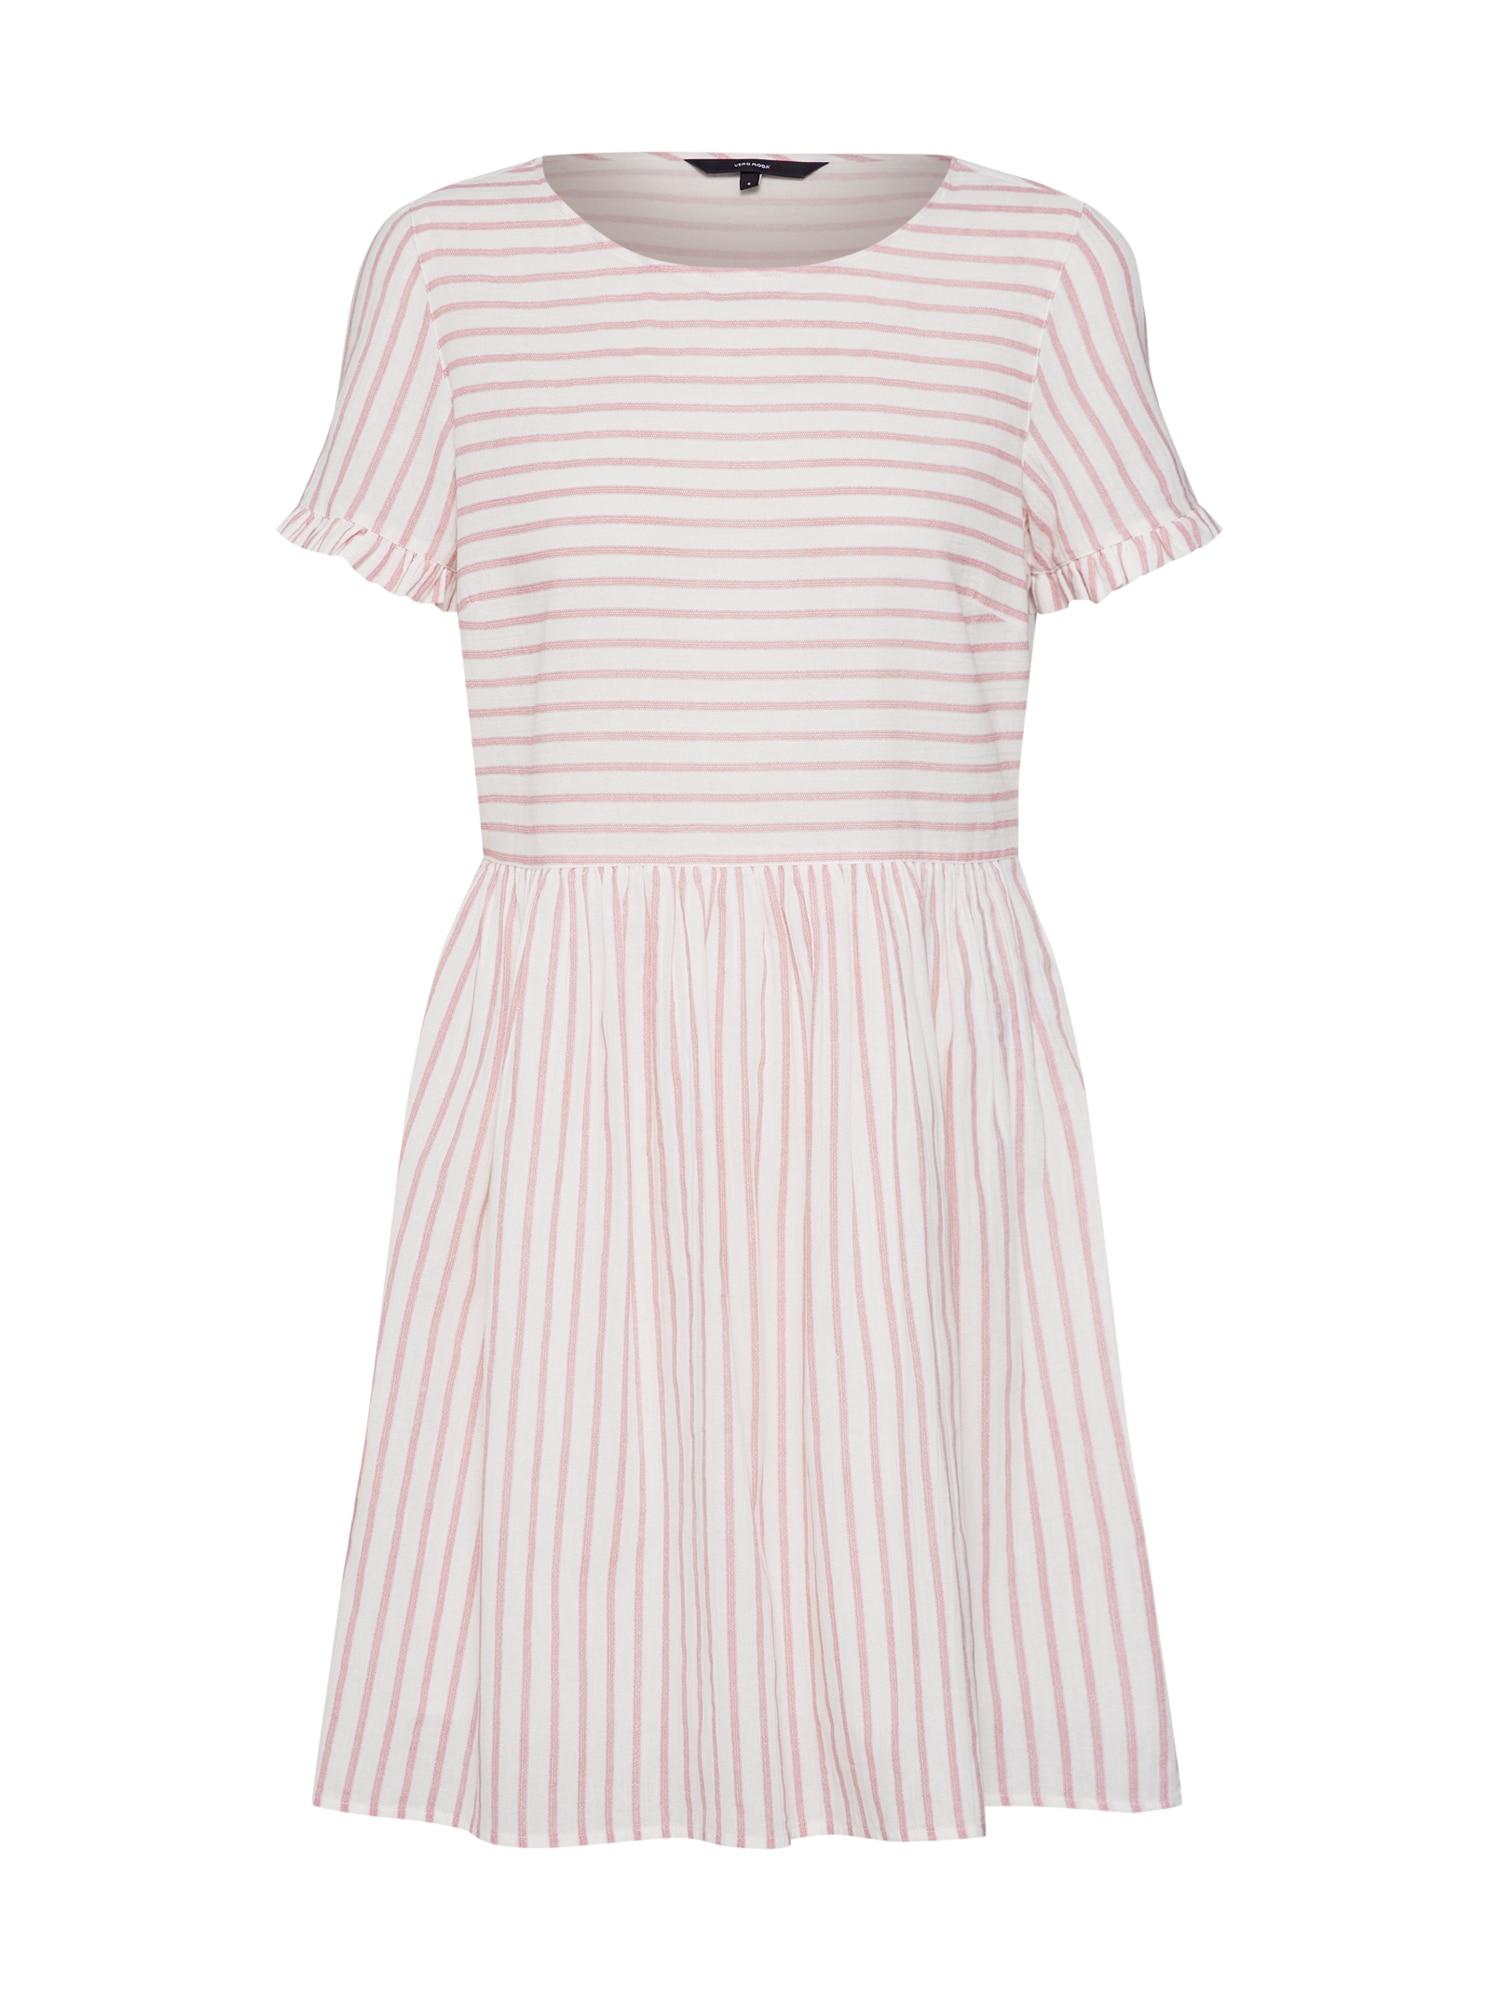 Letní šaty VMCOCO STRIPY SS SHORT DRESS růžová bílá VERO MODA